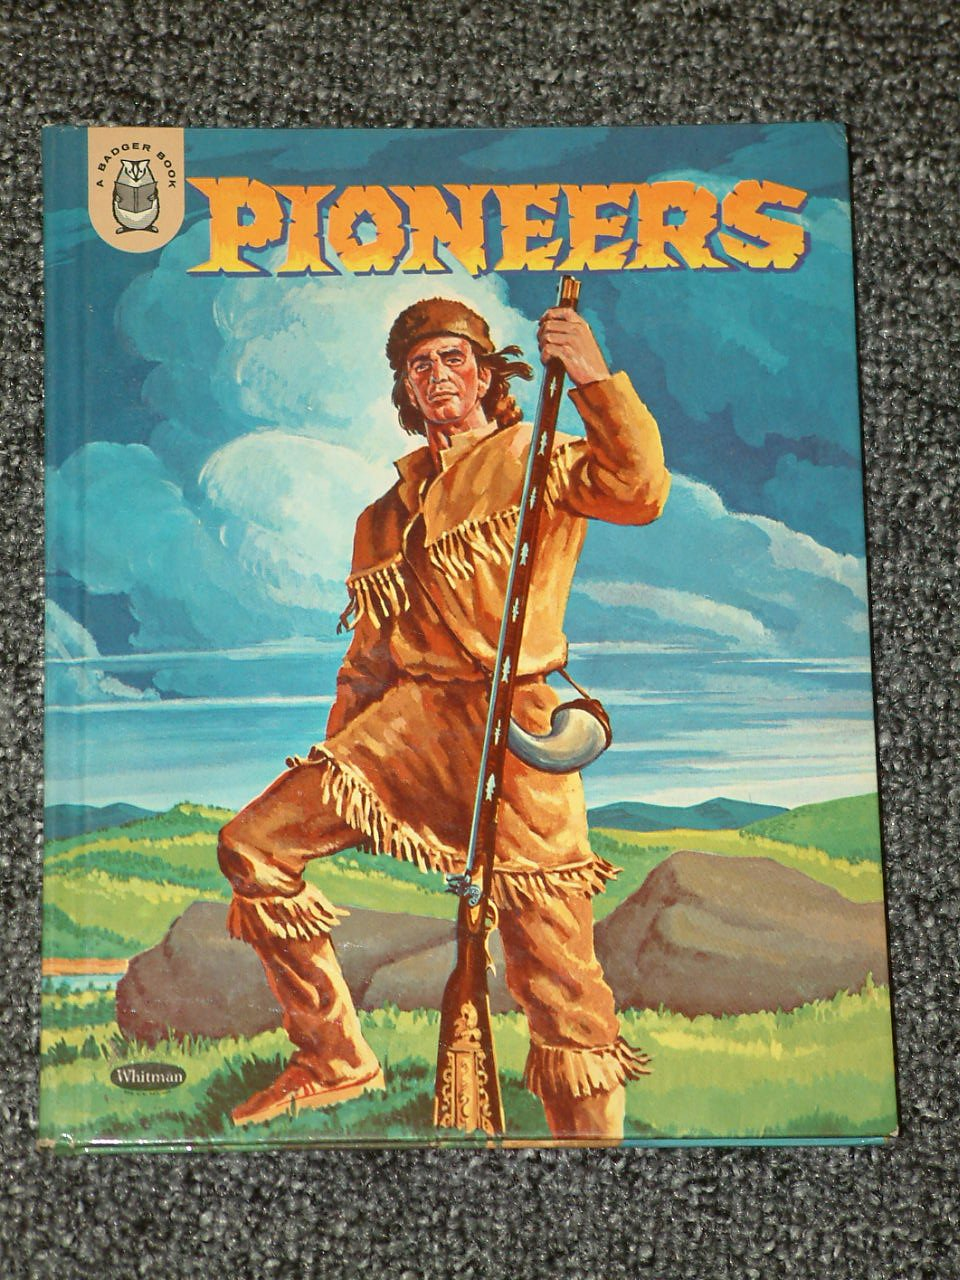 Pioneers by Robin King 1959